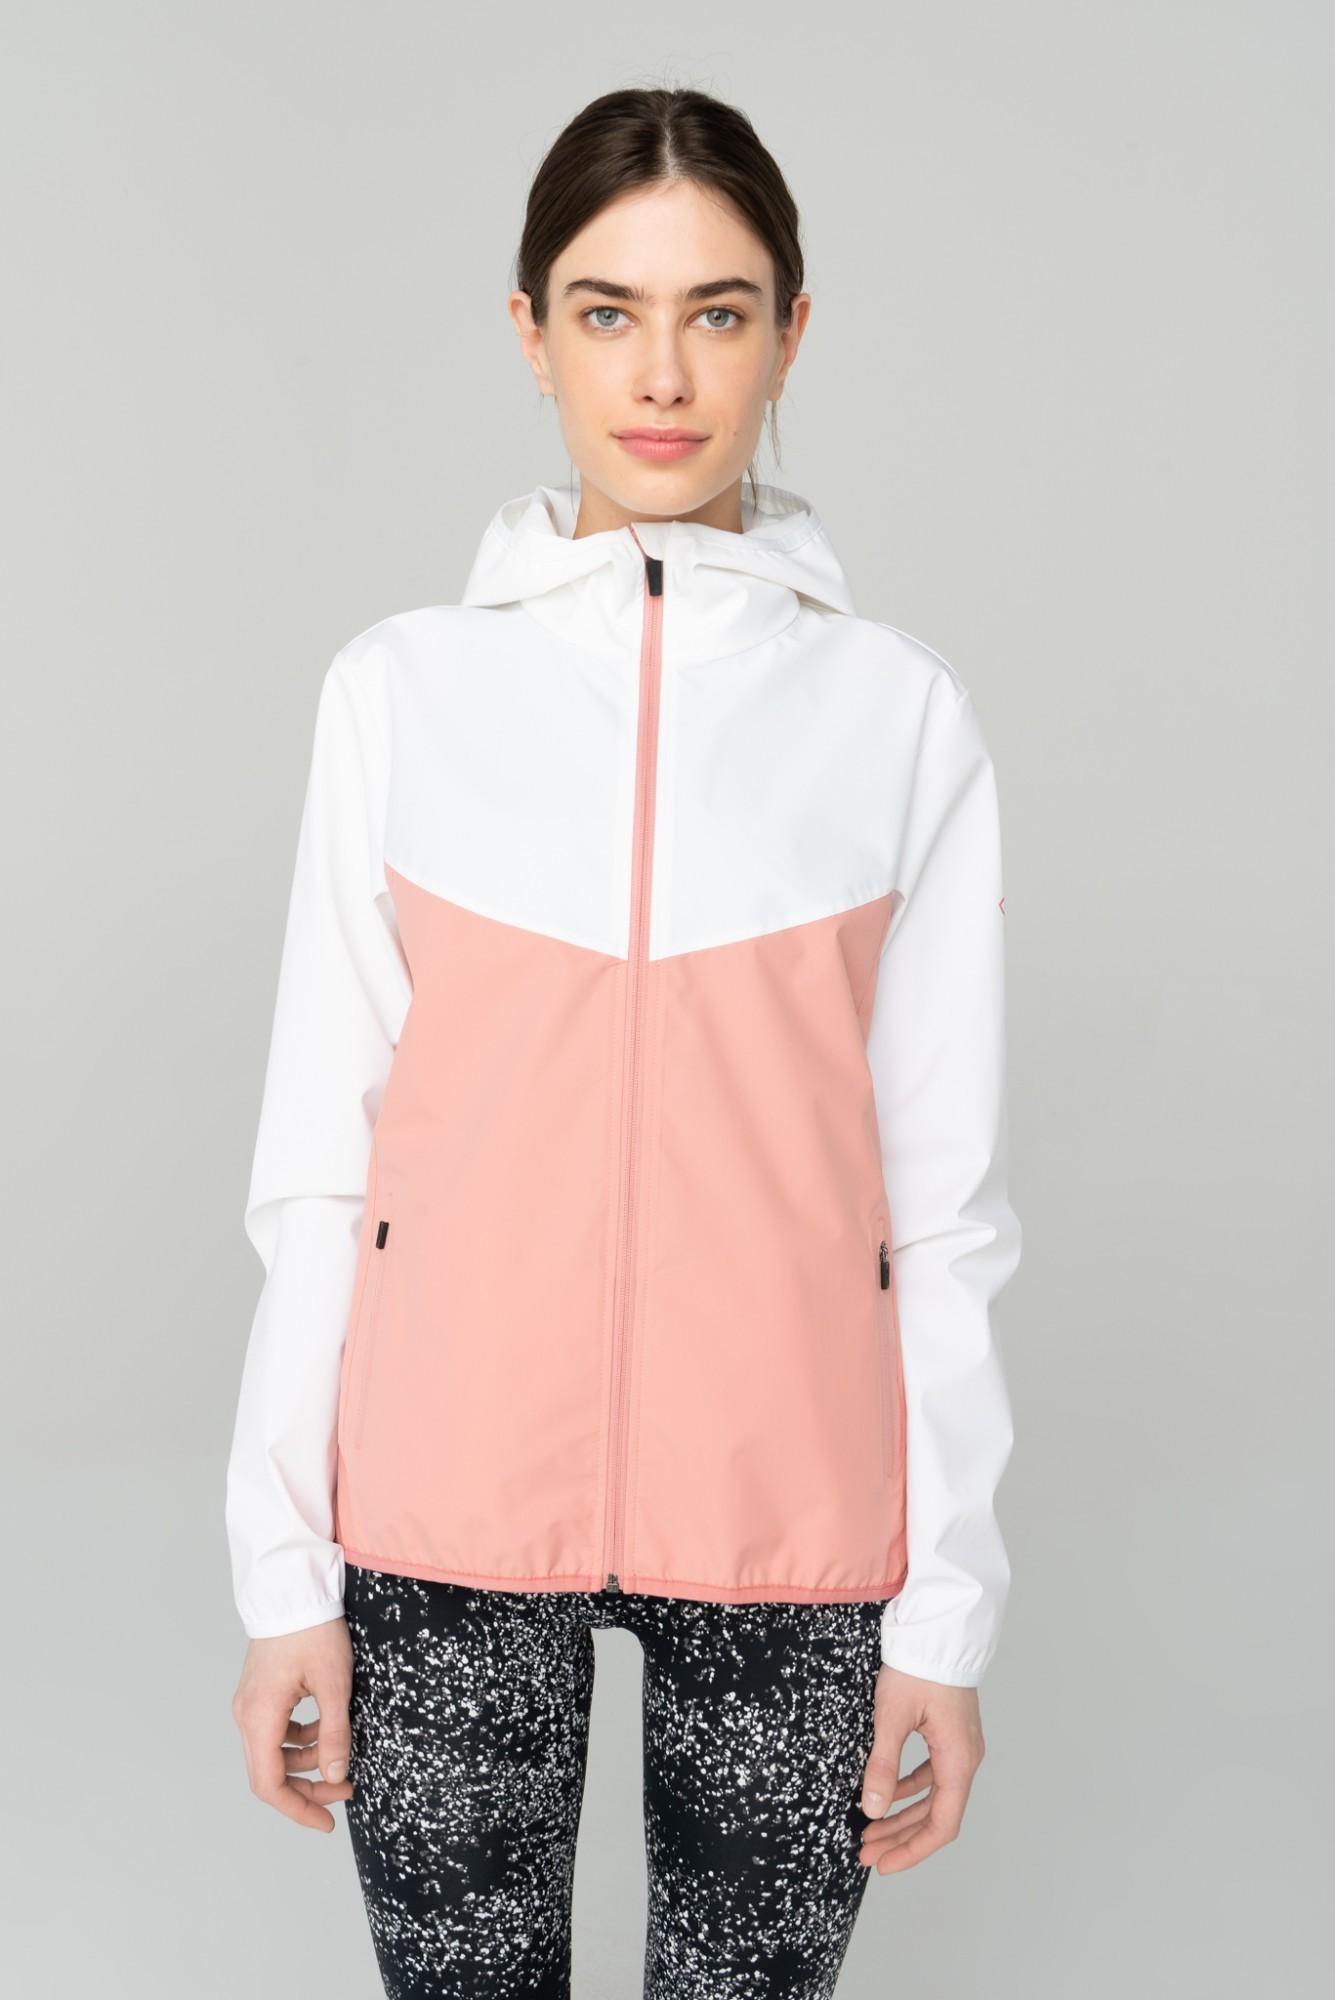 AUDIMAS Lengva vėjastriukė 2111-301 Pink/White XL